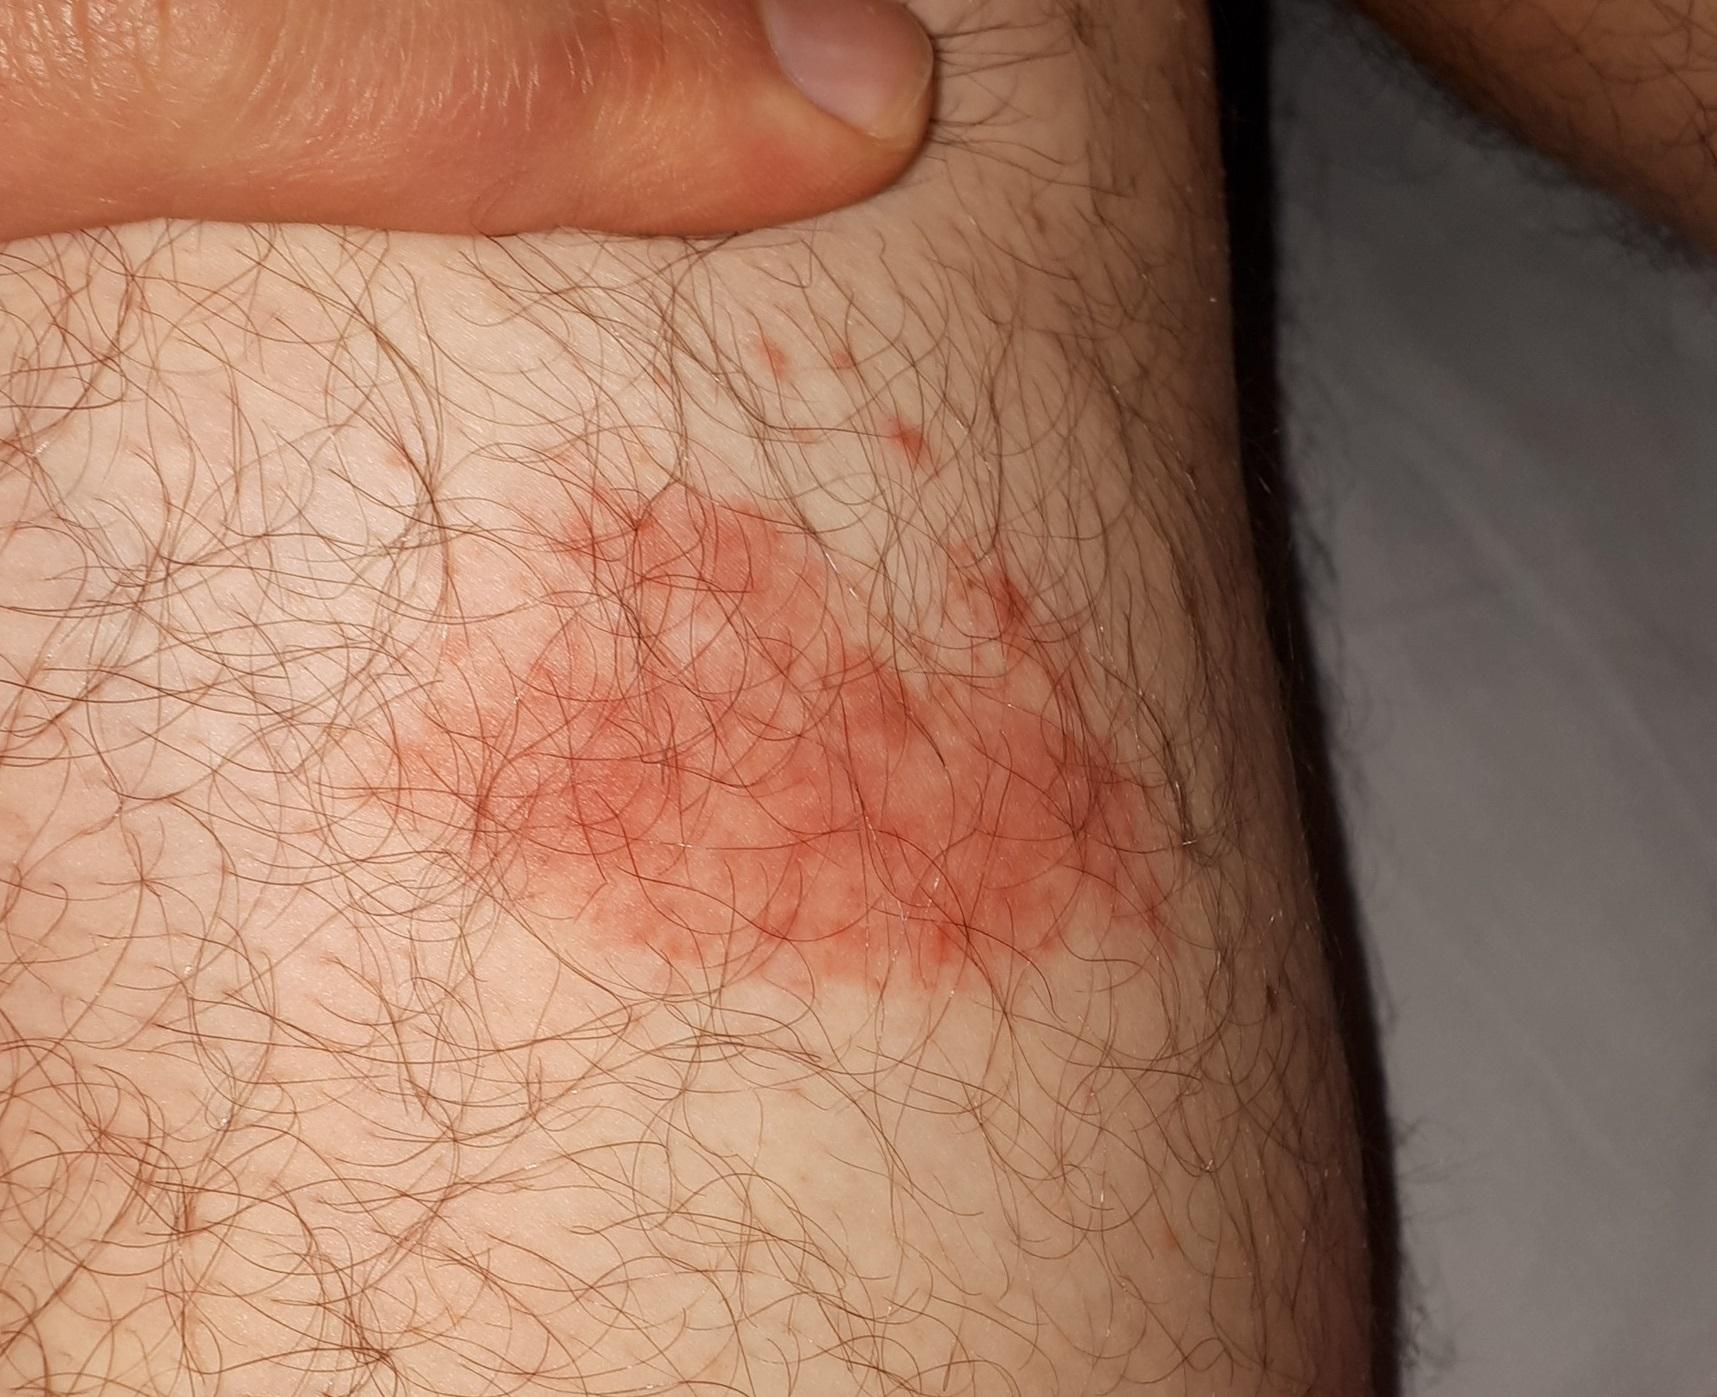 Image Result For Lyme Disease